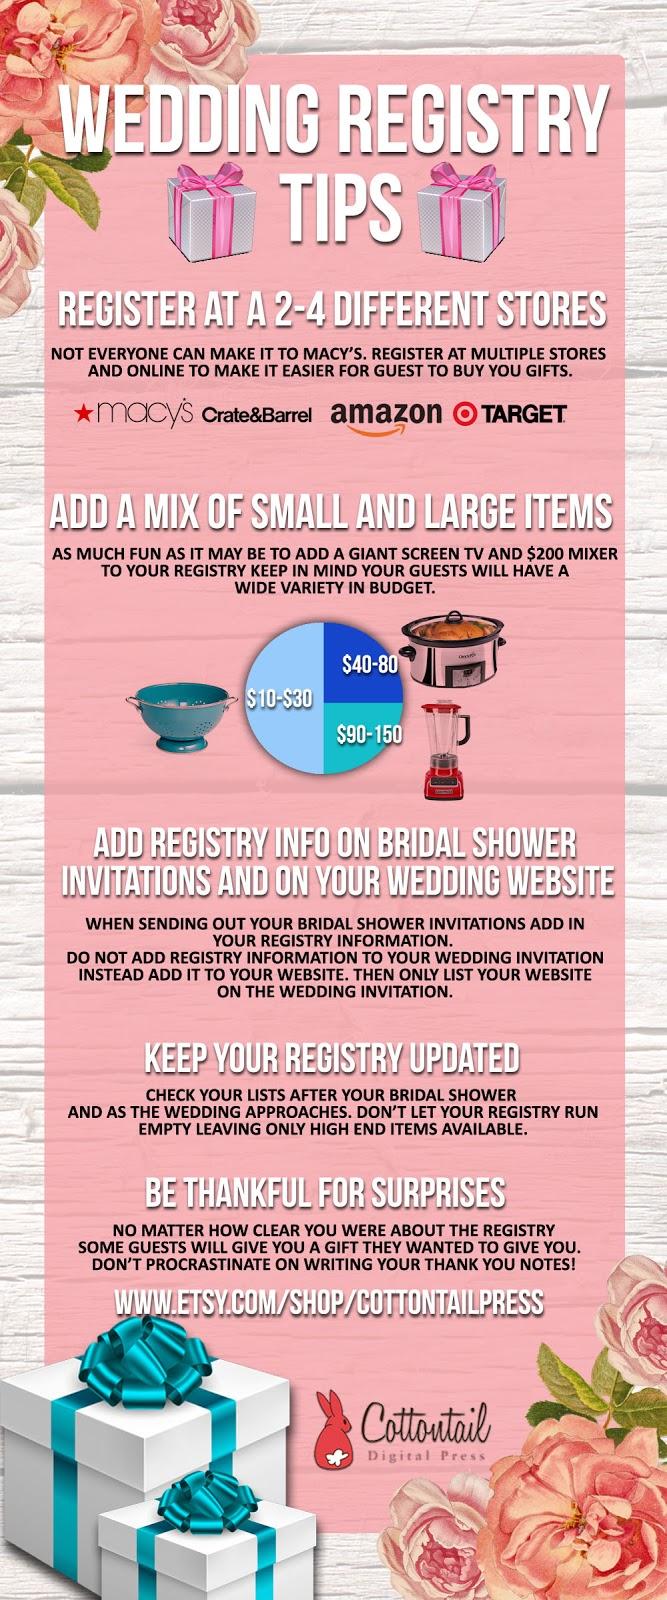 Cottontail Digital Press- Wedding Invitations